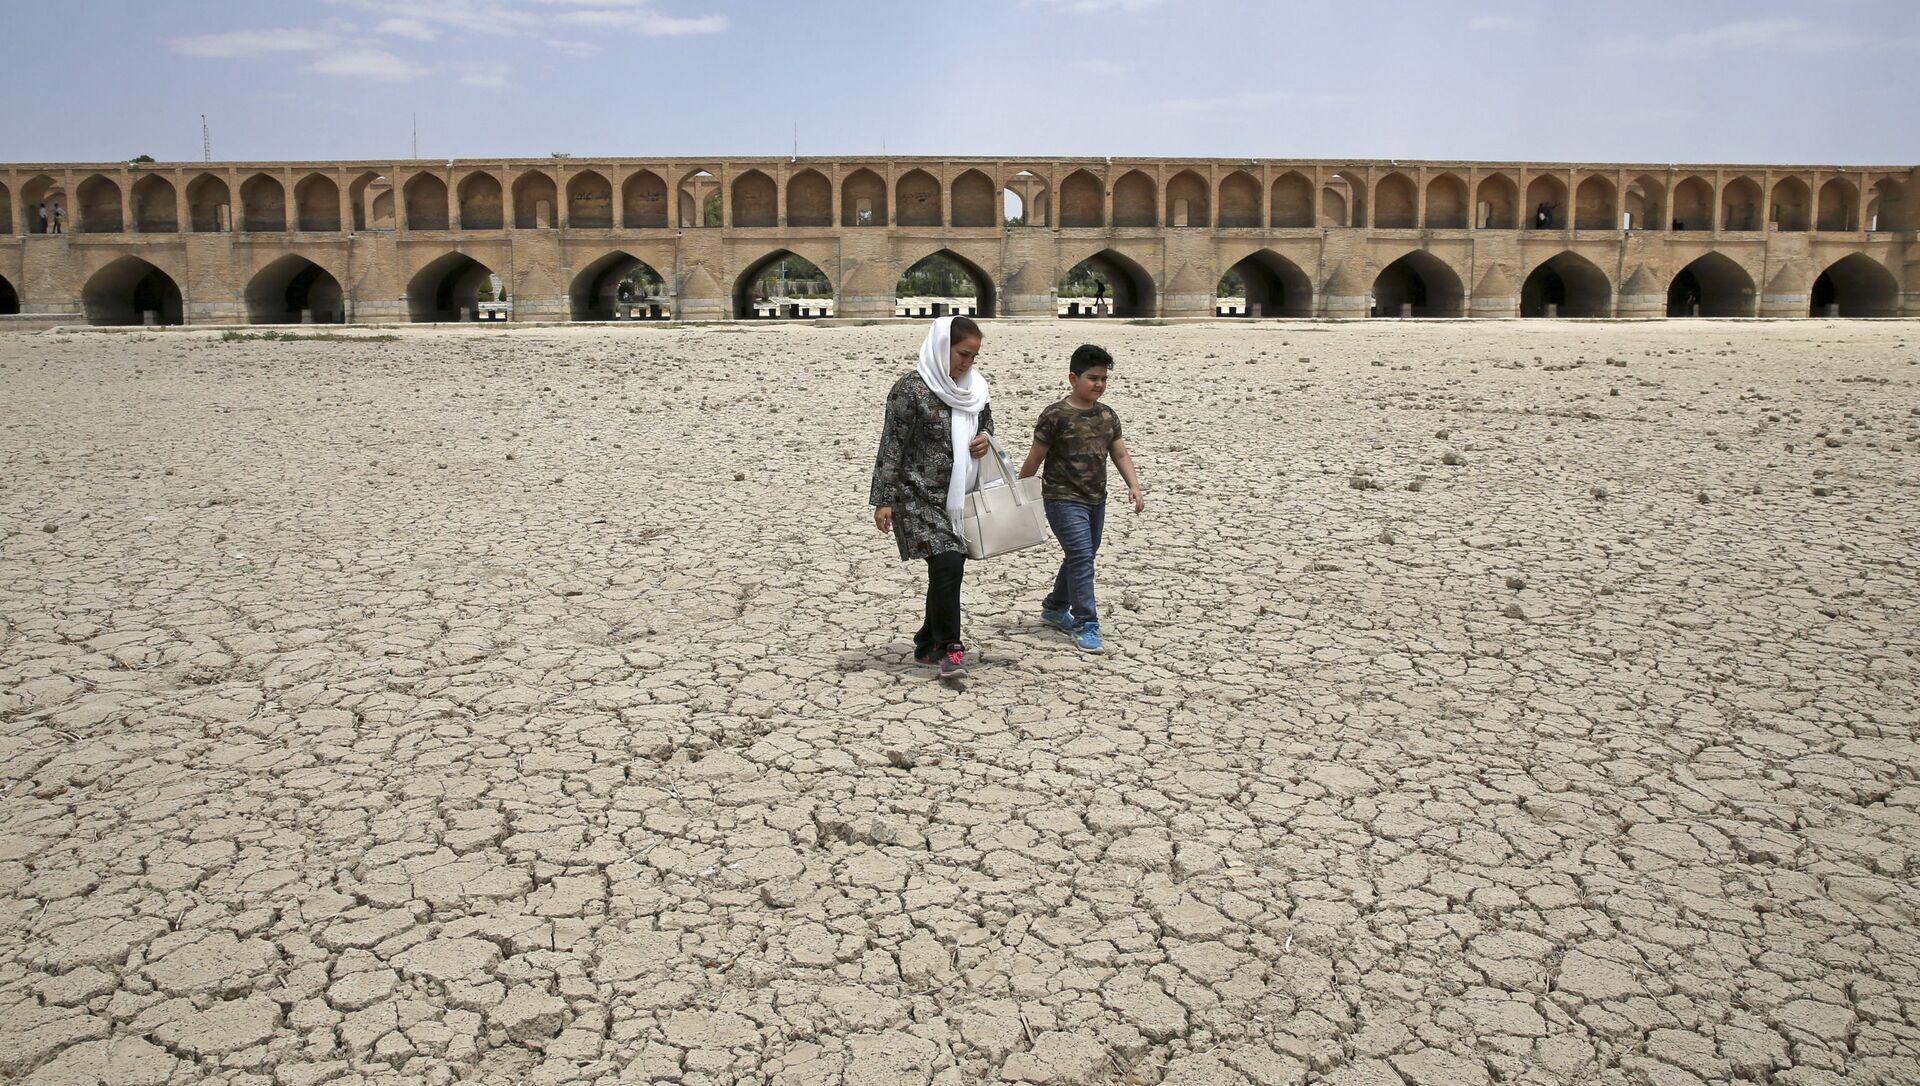 Засуха в Иране - Sputnik Азербайджан, 1920, 23.07.2021